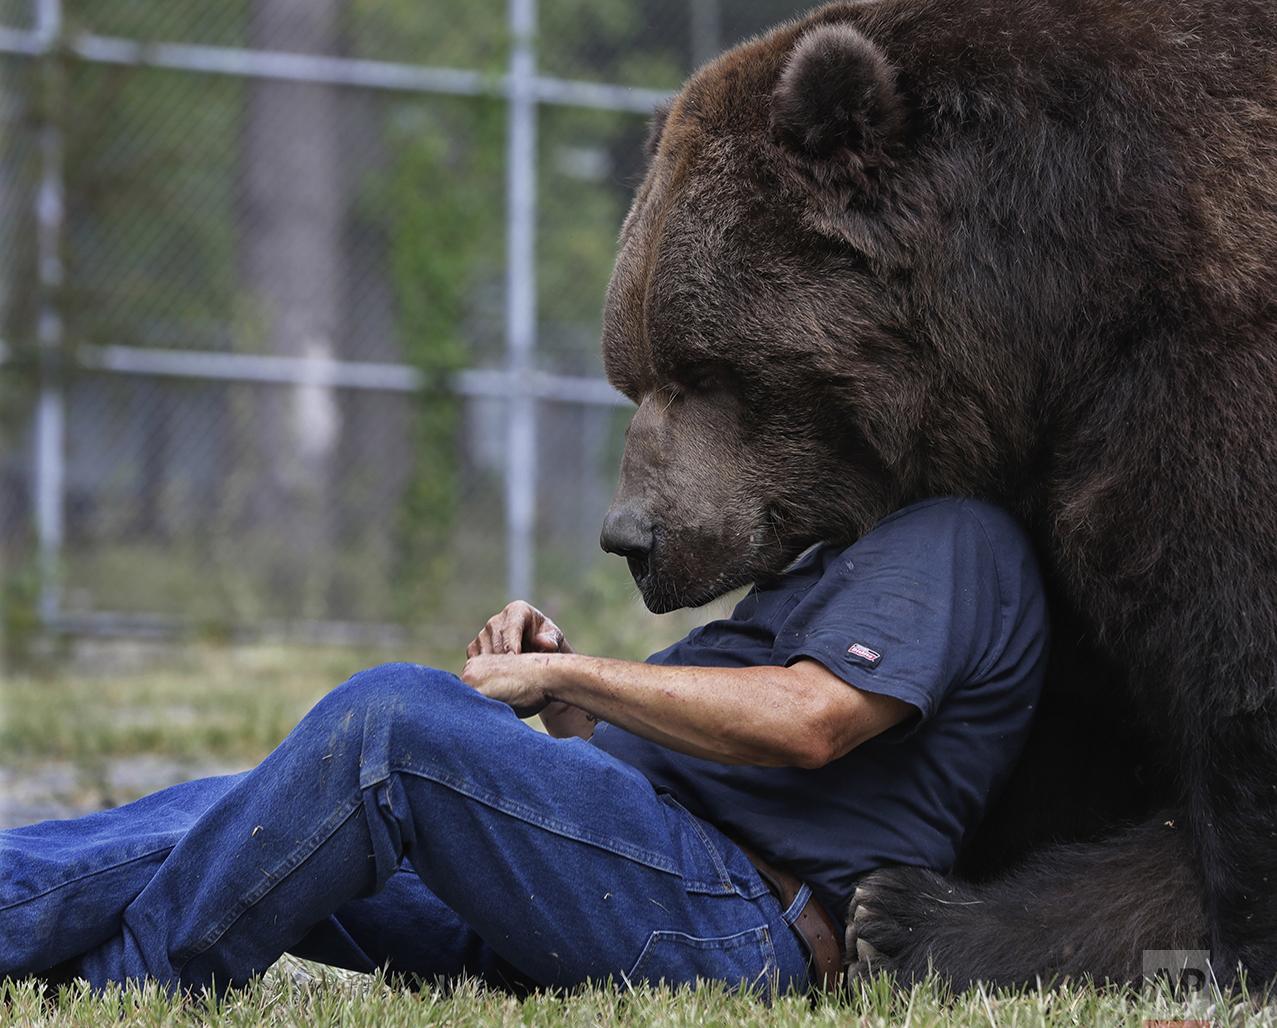 Jim Kowalczik plays with Jimbo, a 1500-pound Kodiak bear, at the Orphaned Wildlife Center in Otisville, N.Y., on Sept. 7, 2016. (AP Photo/Mike Groll)